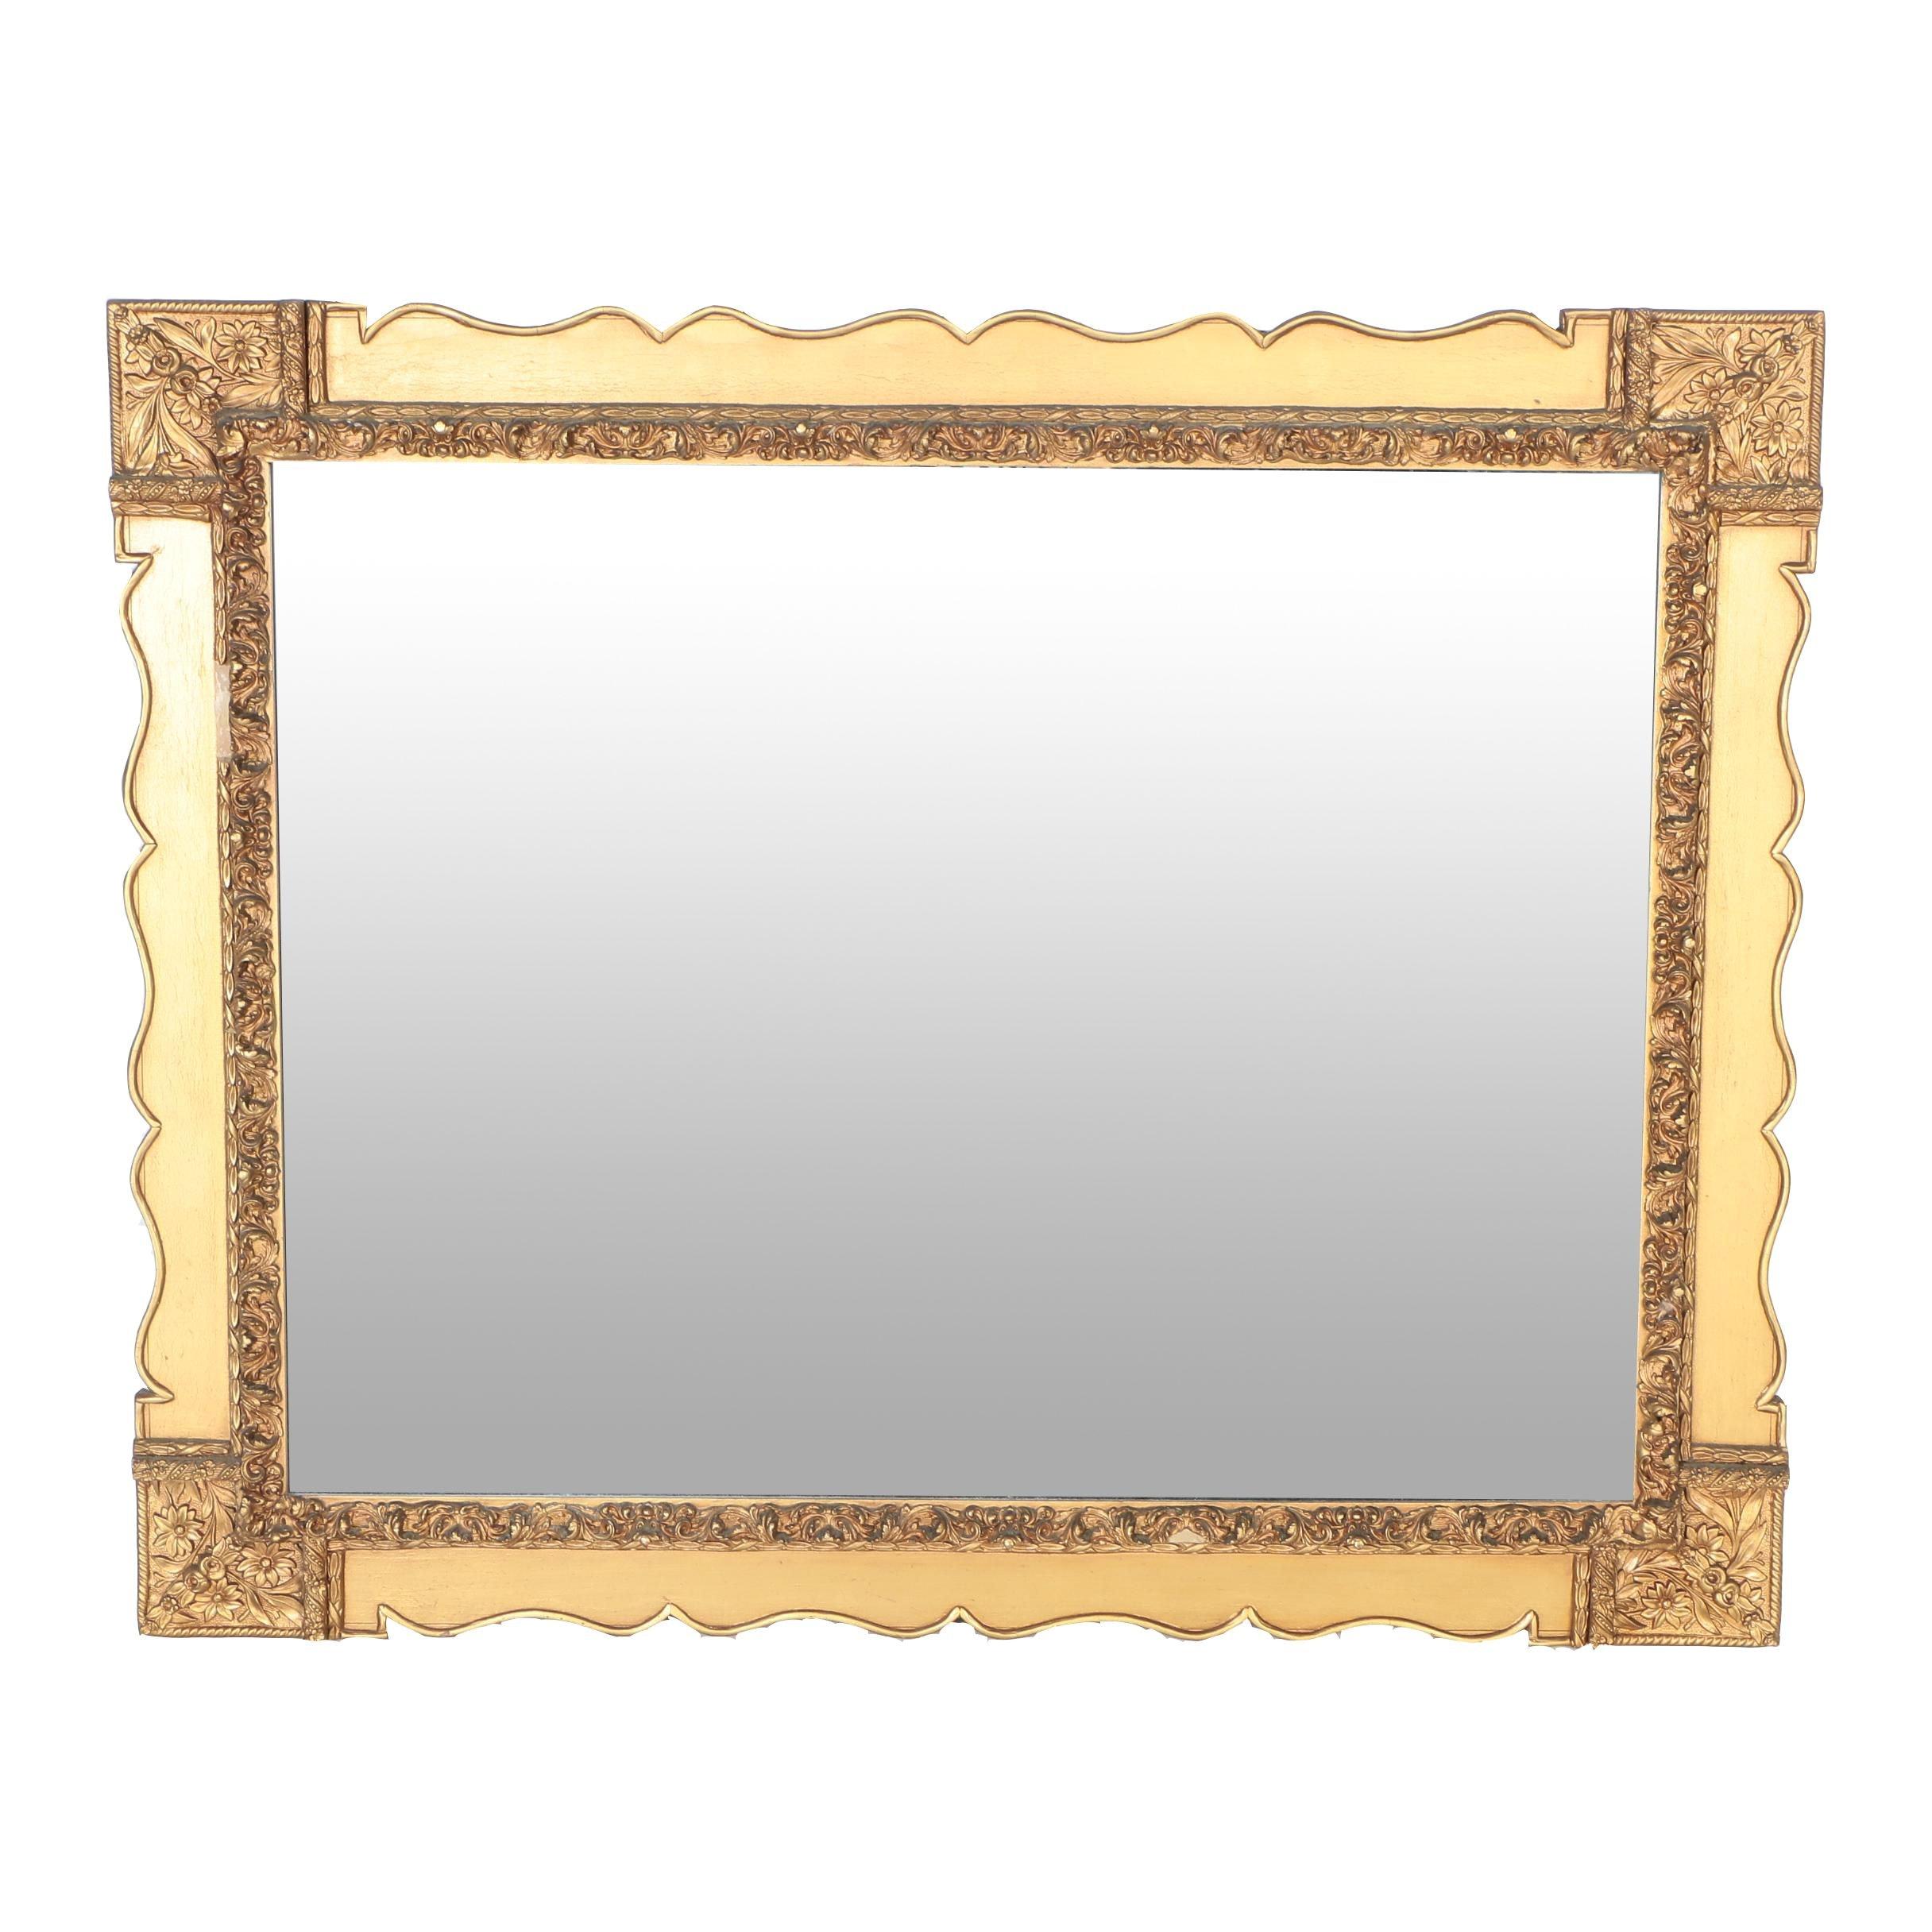 Rectangular Baroque Style Wall Mirror